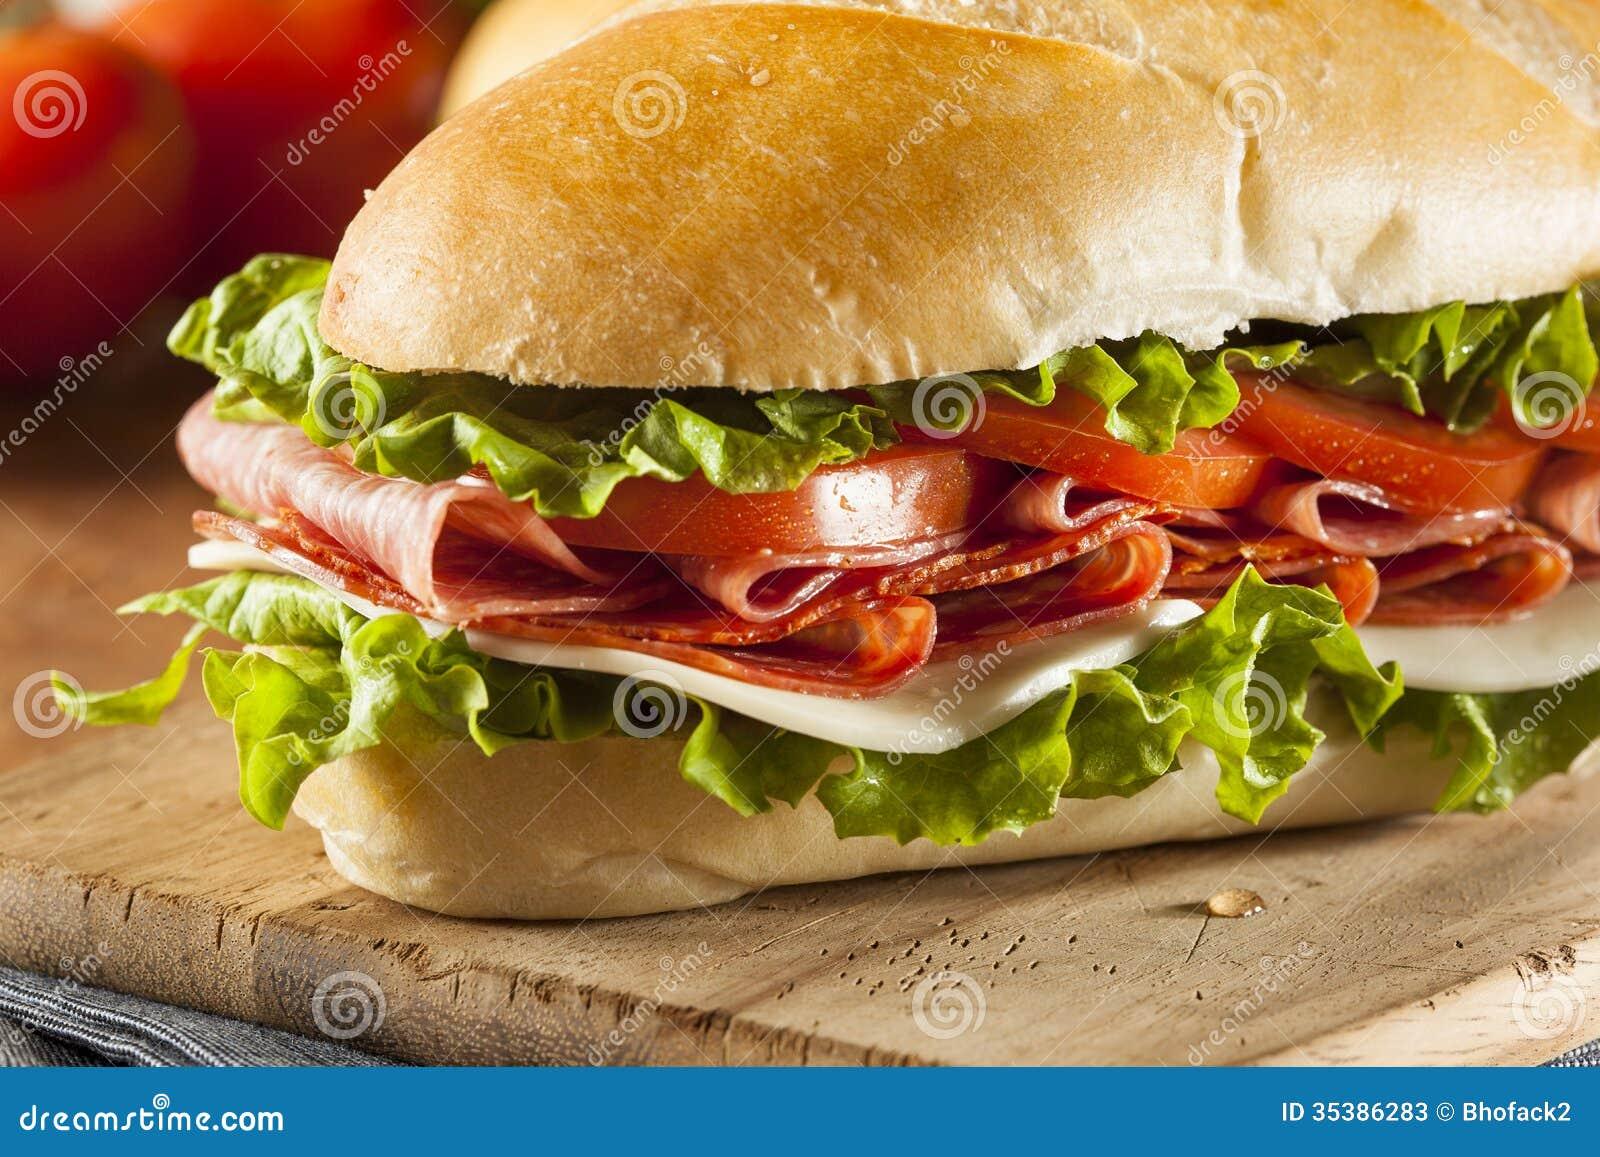 Homemade Italian Sub Sandwich with Salami, Tomato, and Lettuce.